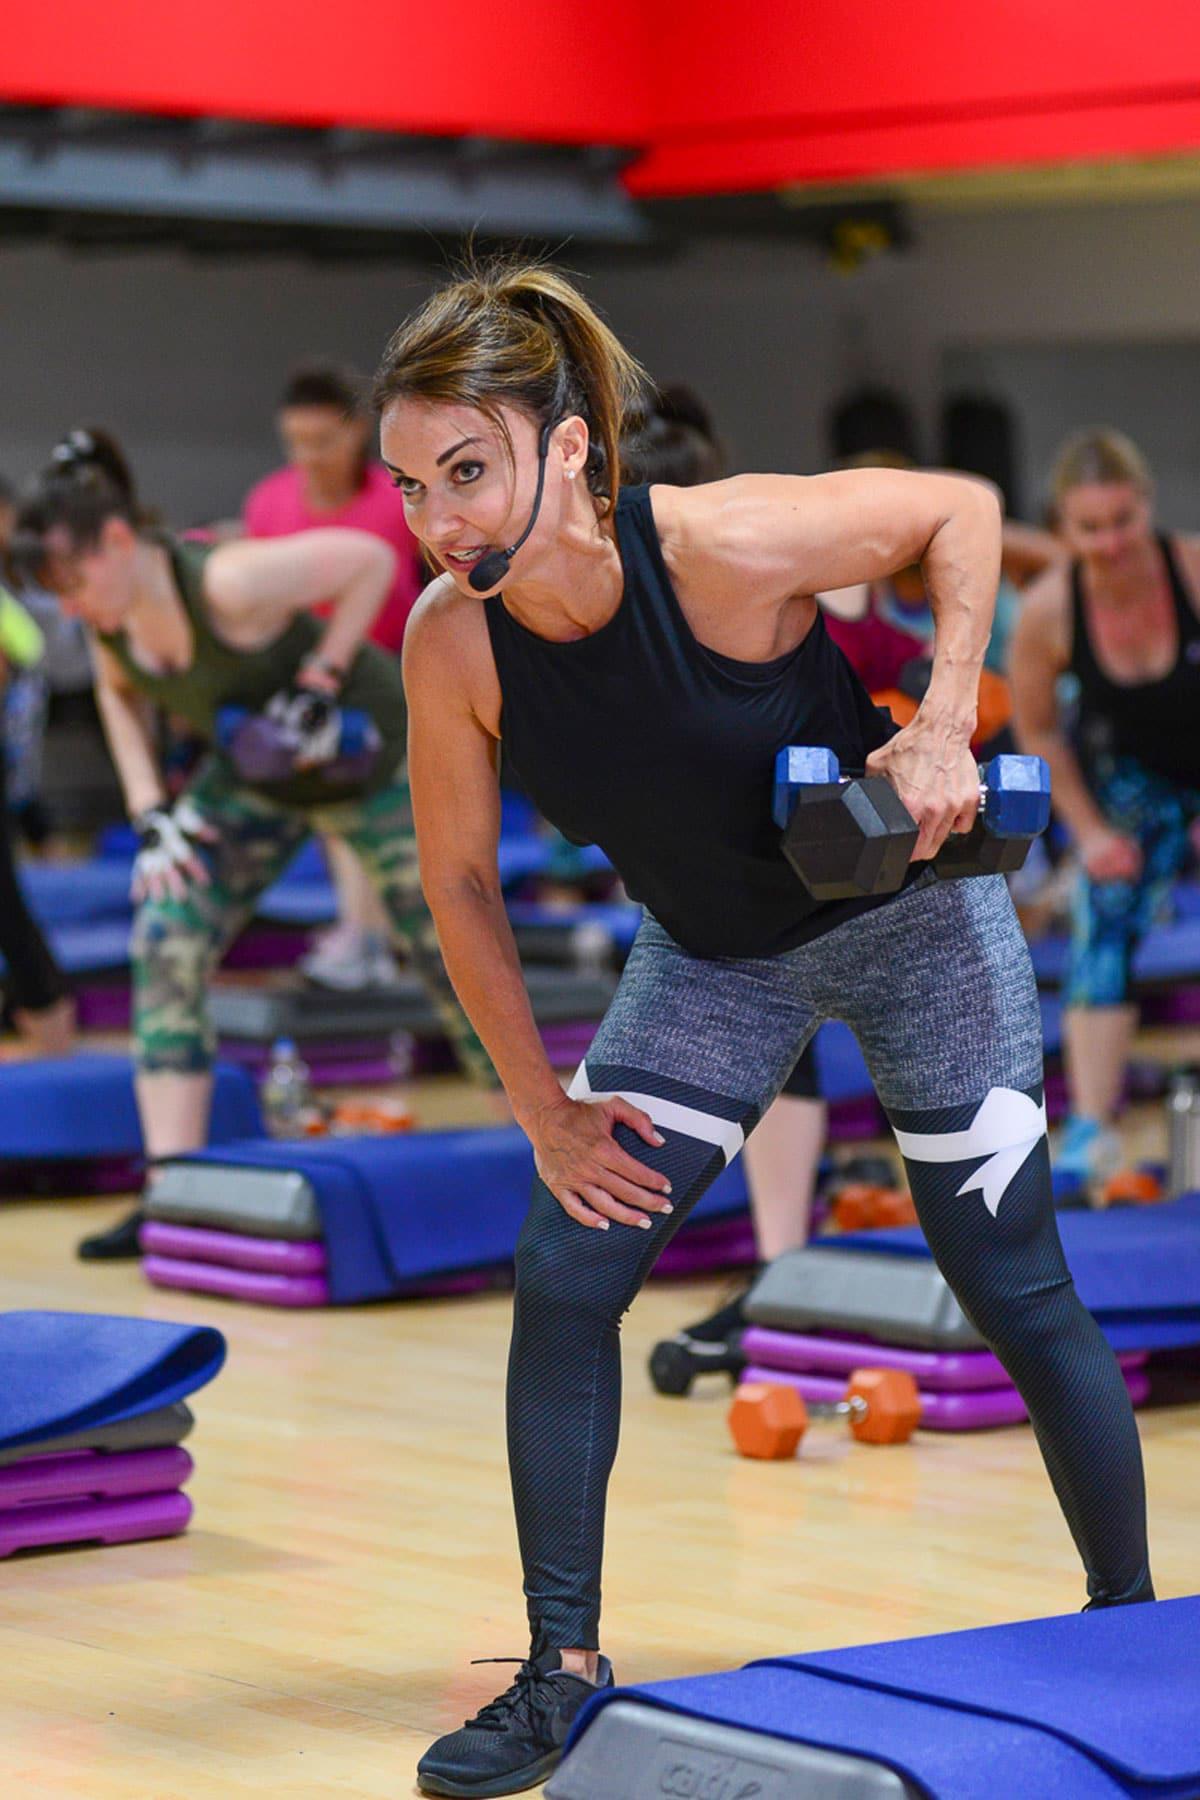 Strength Training & Lower Blood Pressure